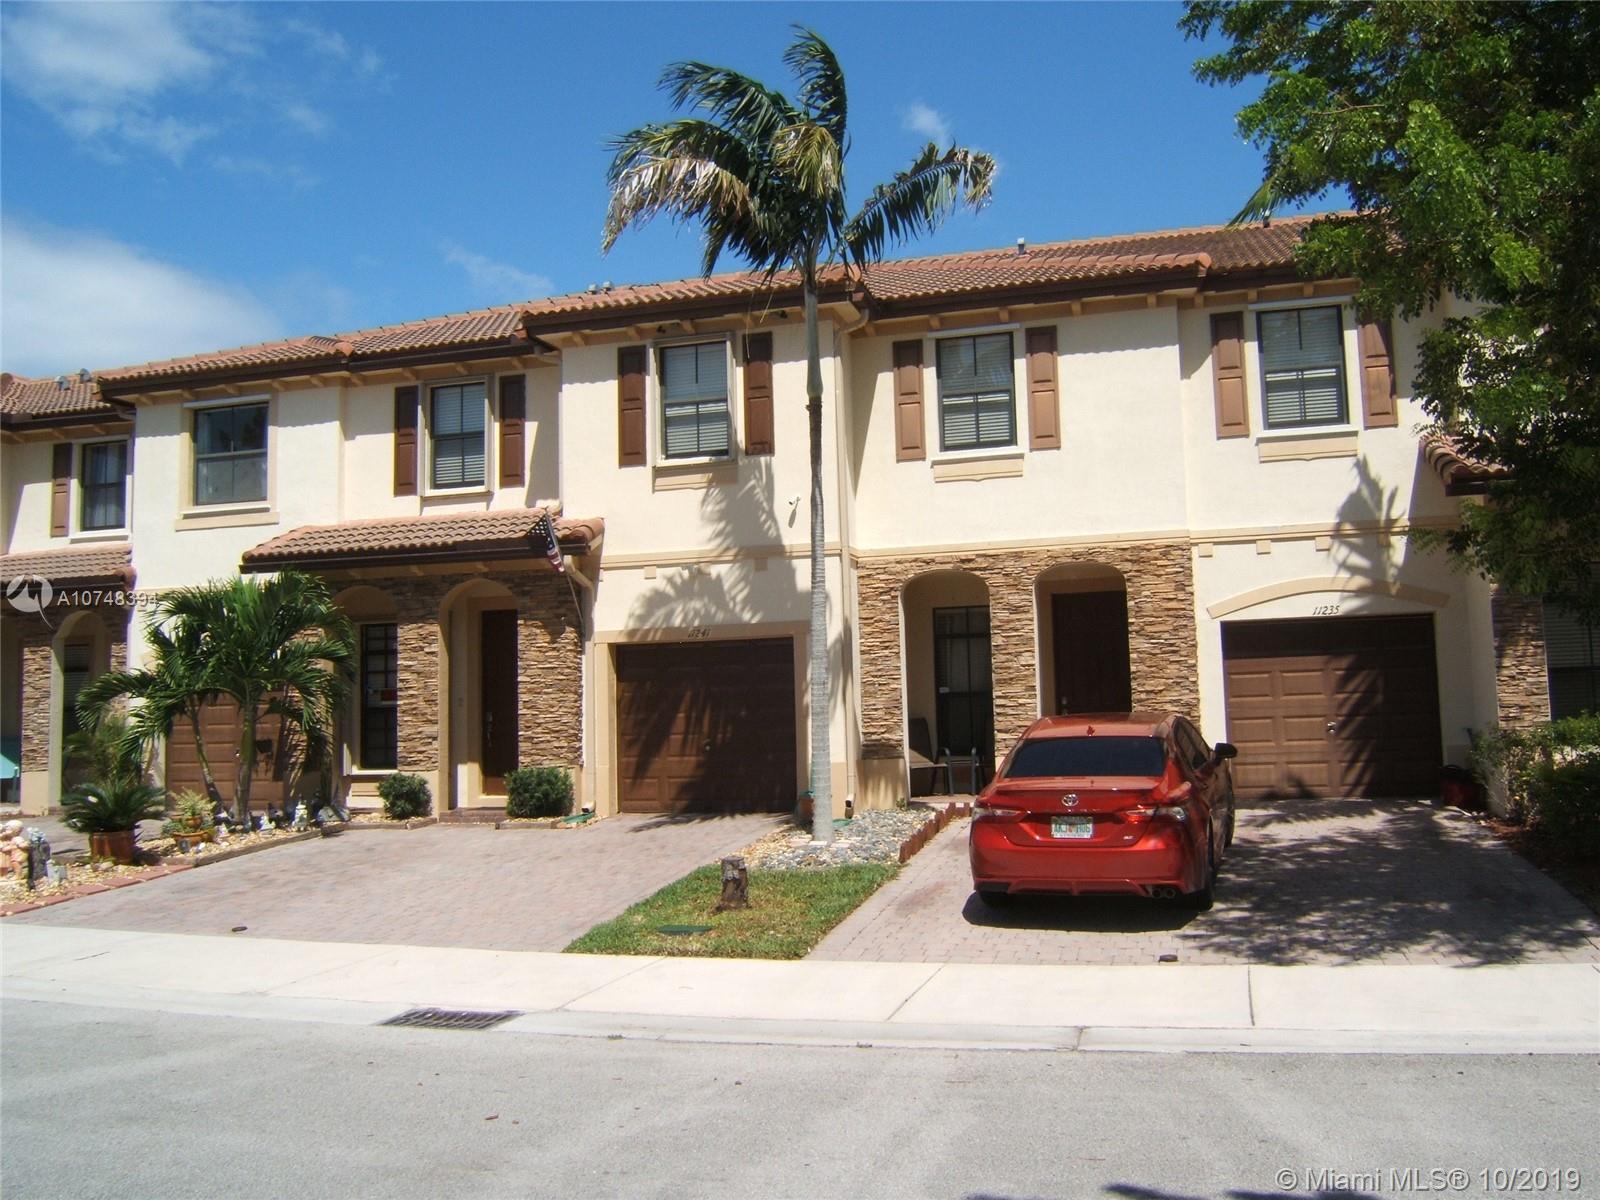 11235 SW 240th St #11235, Homestead, FL 33032 - Homestead, FL real estate listing